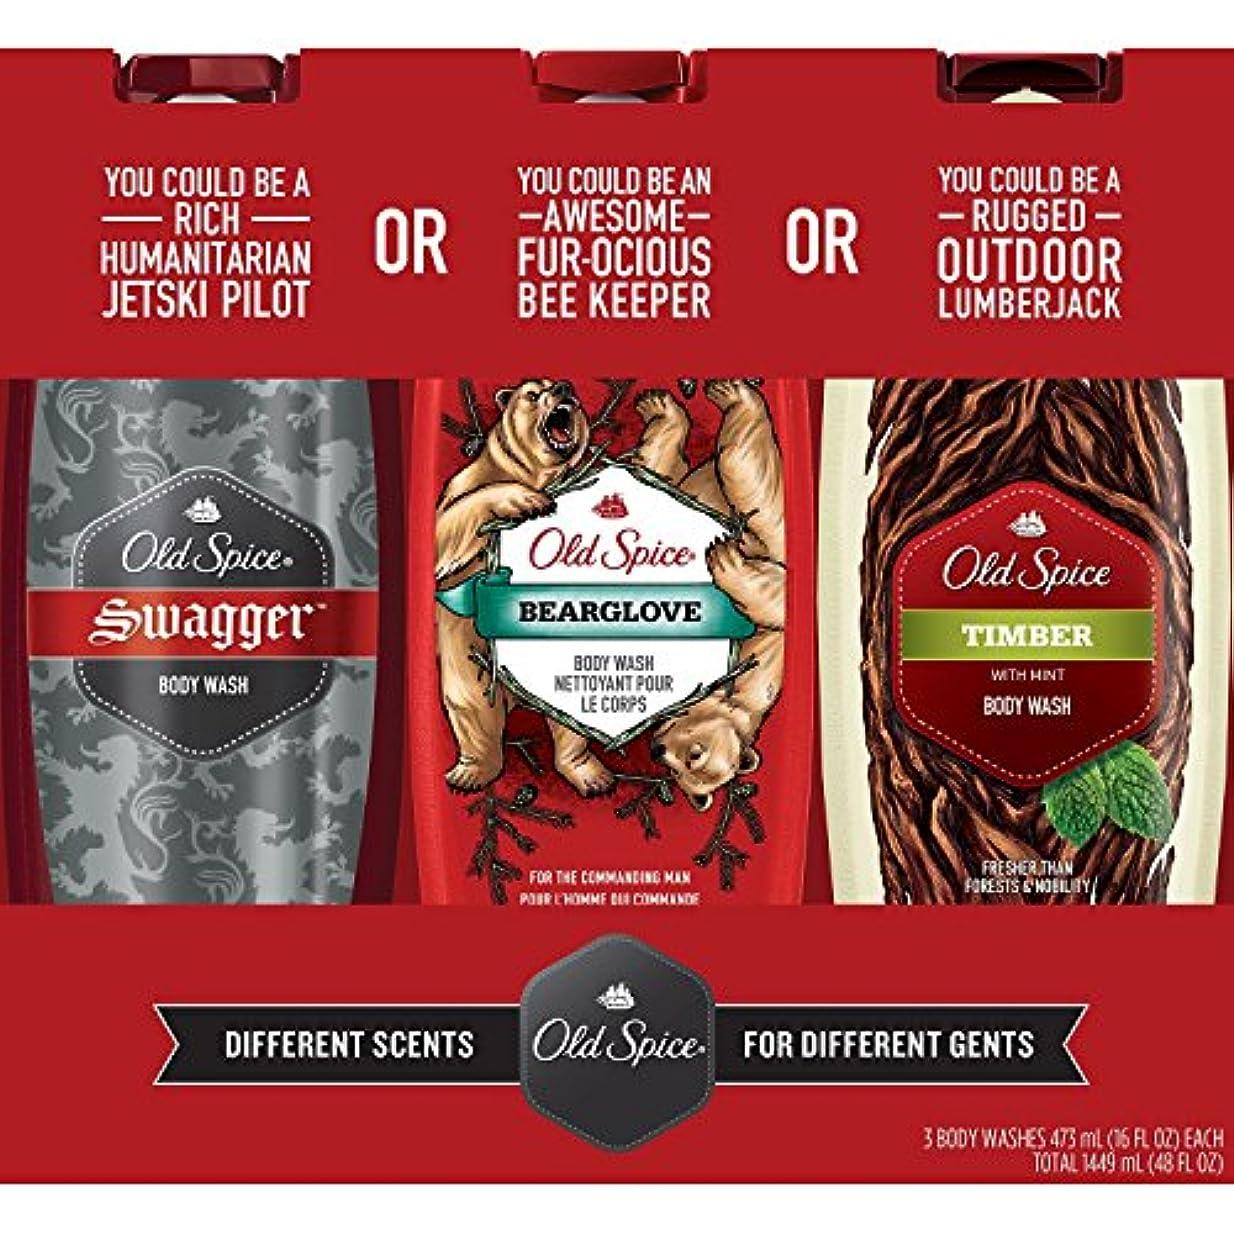 請願者把握試すOld Spice Body Wash Variety Pack (16 fl. oz., 3 pk by Procter & Gamble [並行輸入品]